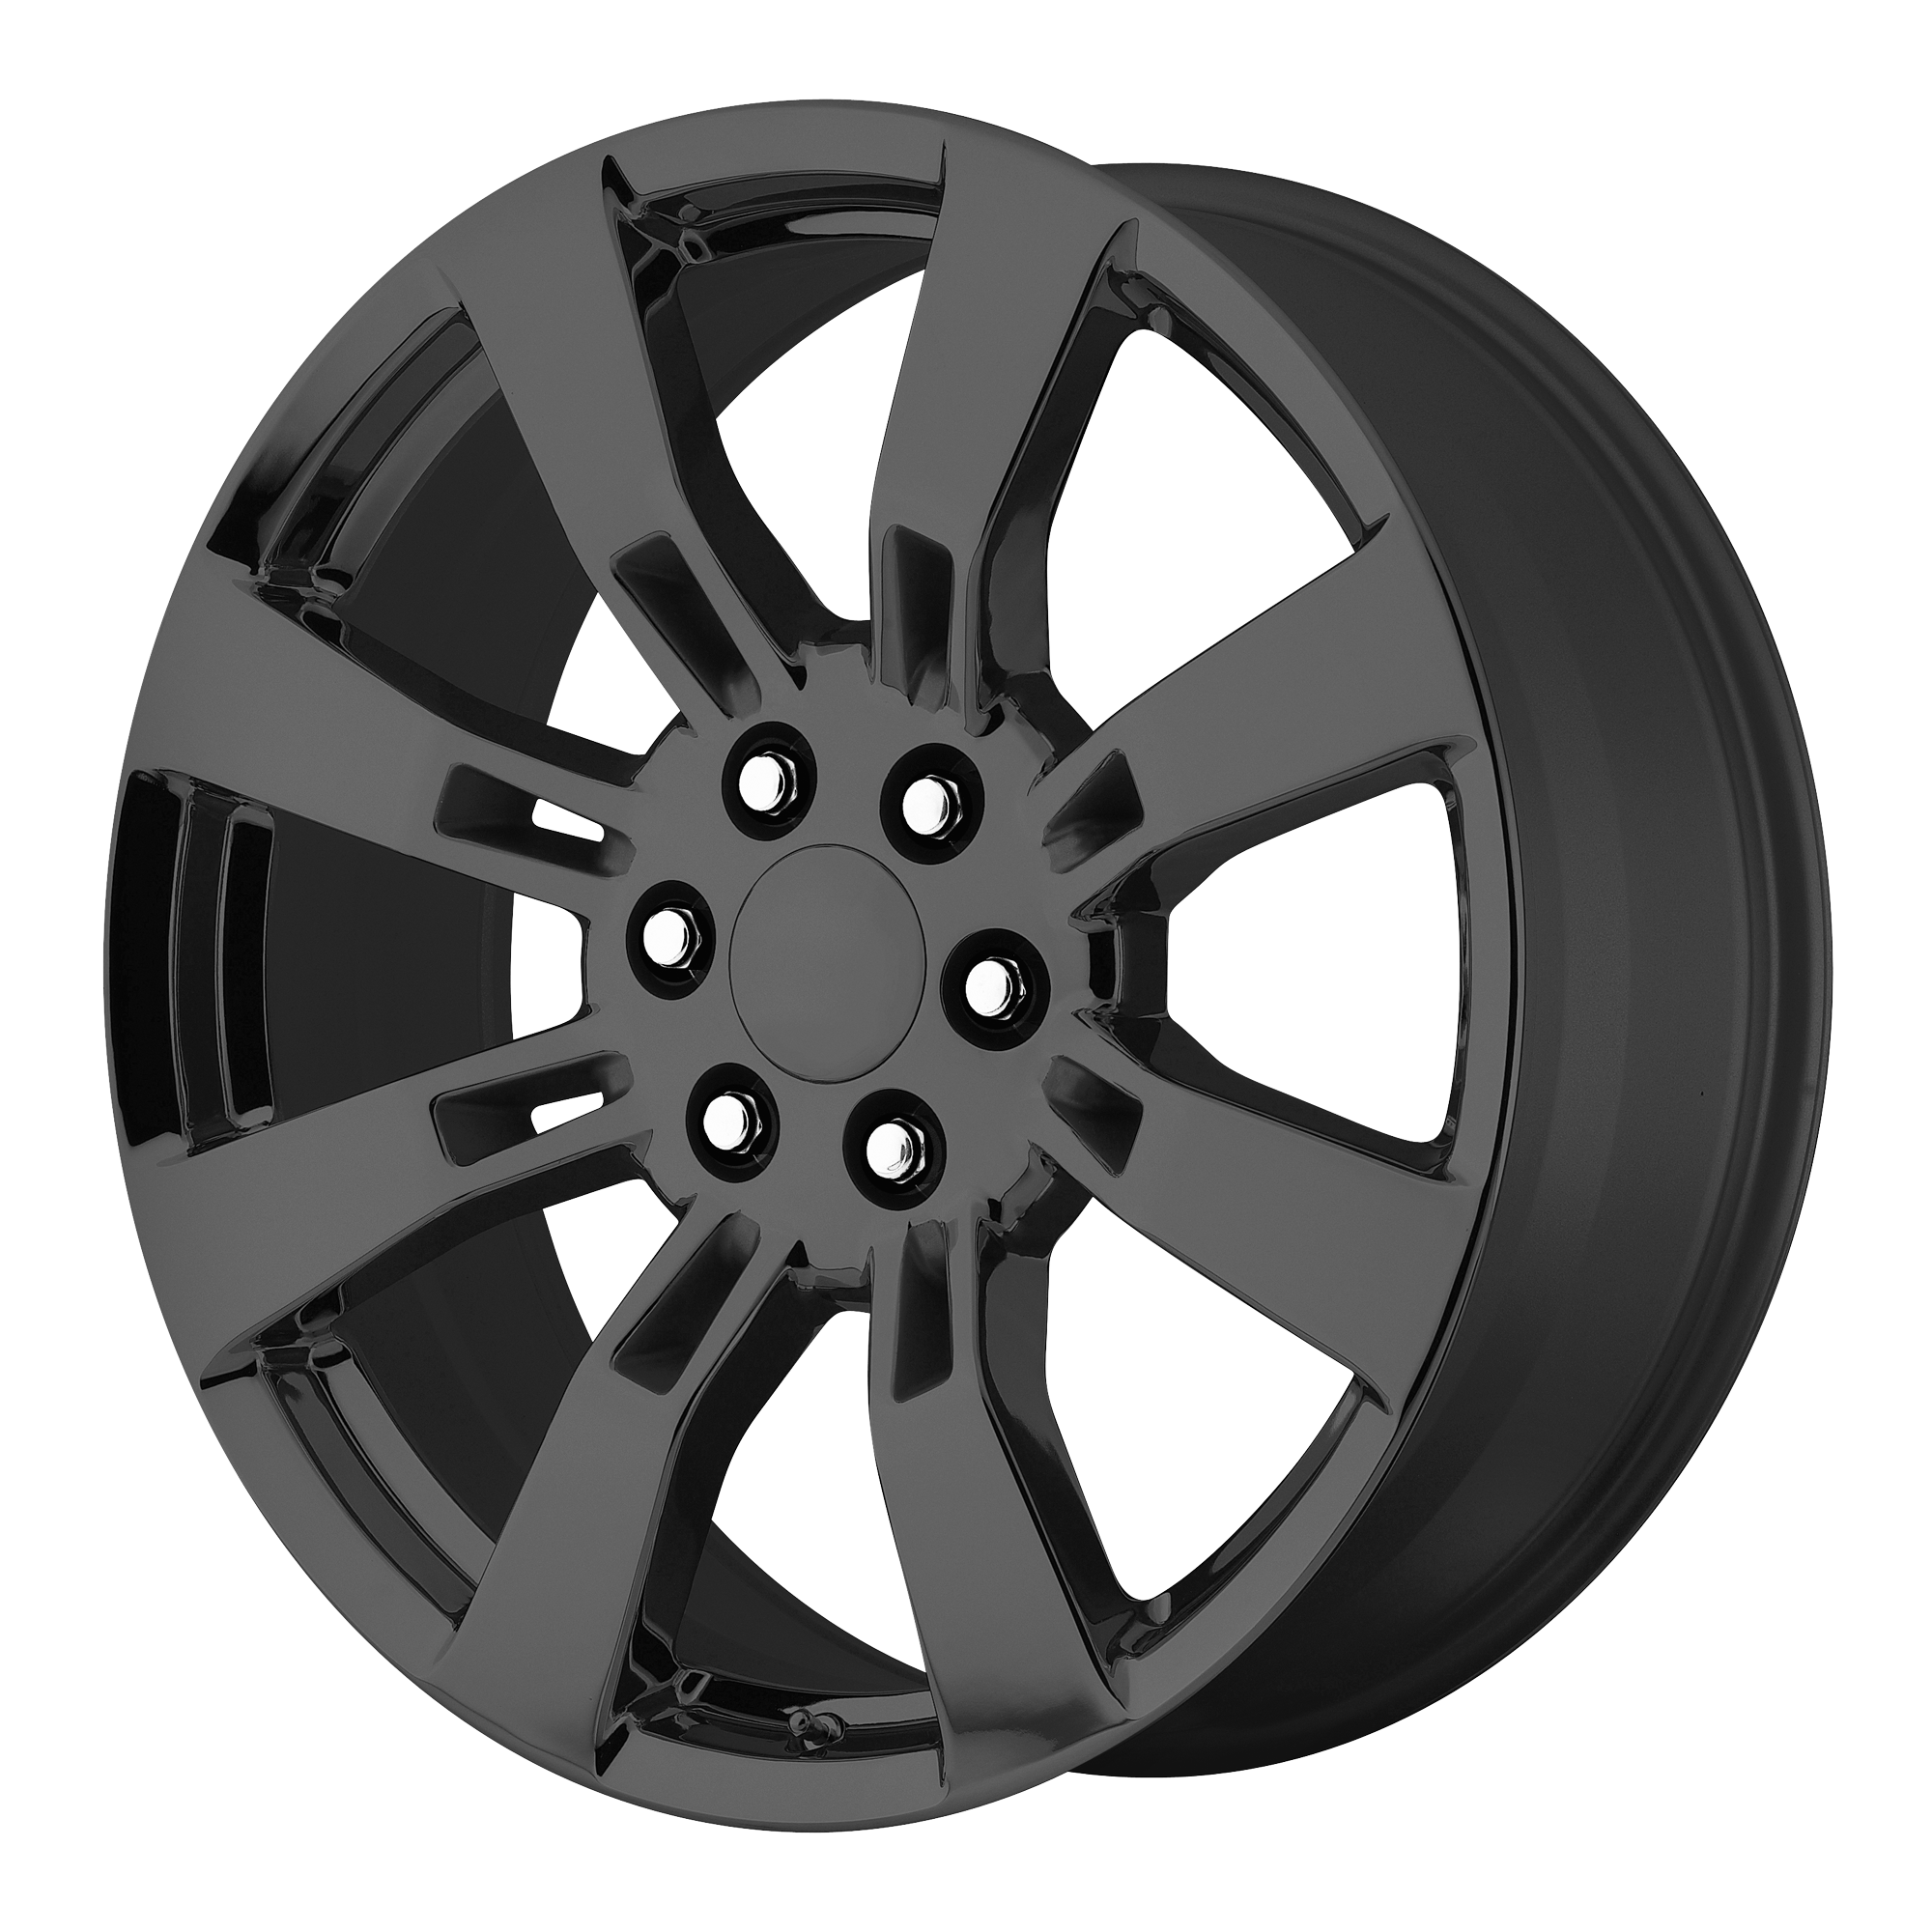 OE Creations Replica Wheels OE Creations PR144 Gloss Black